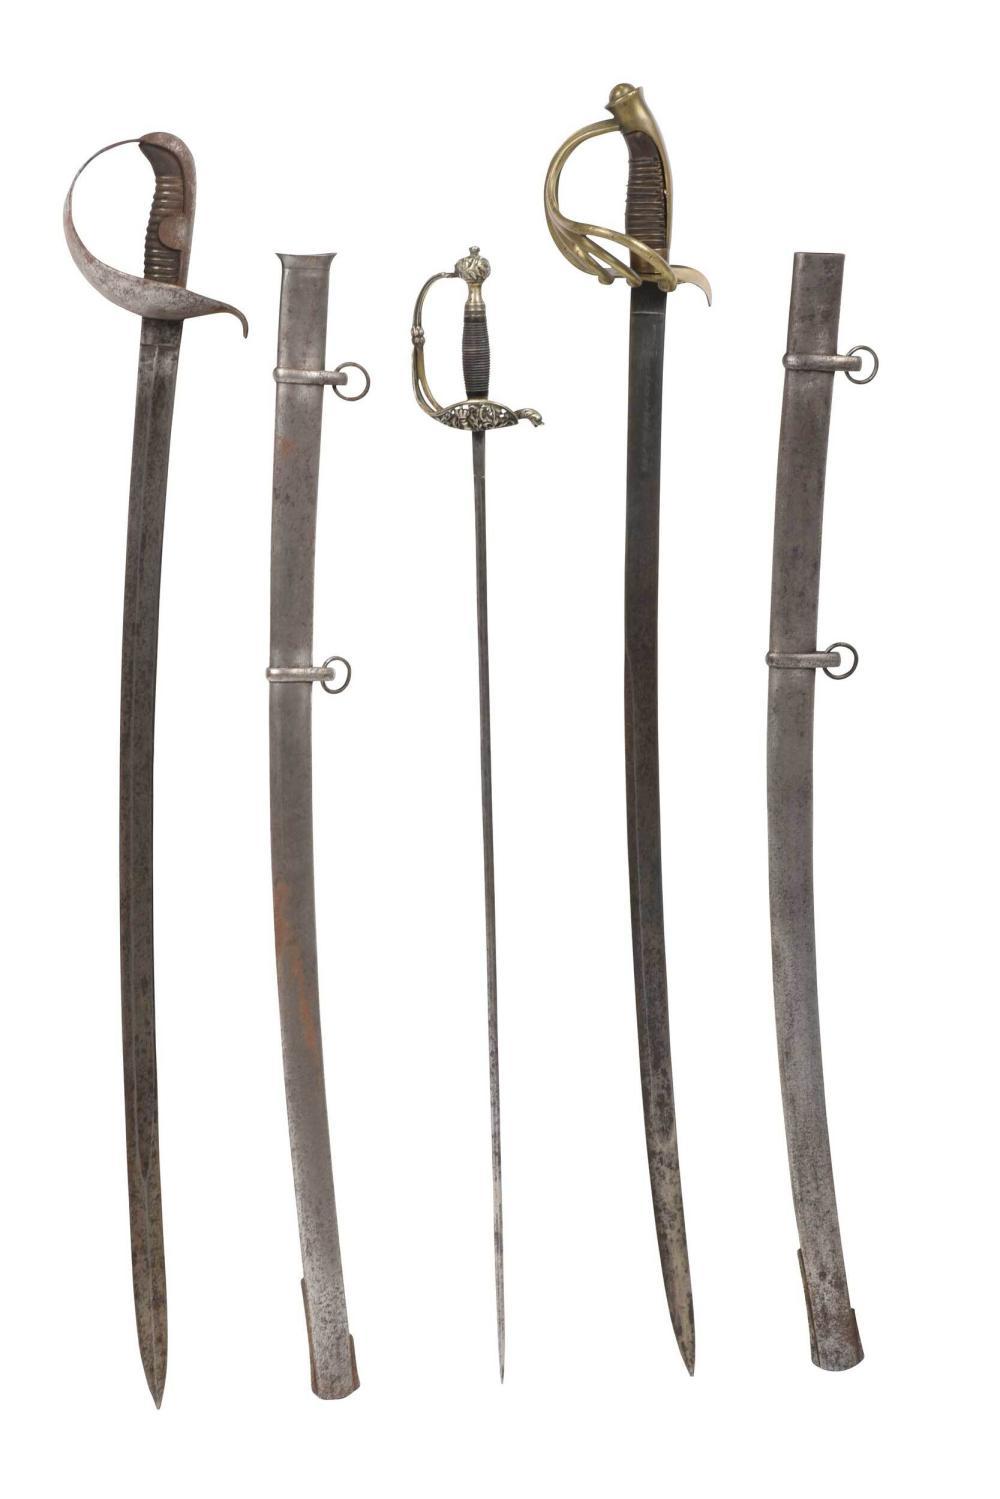 Three Spanish Bladed Weapons